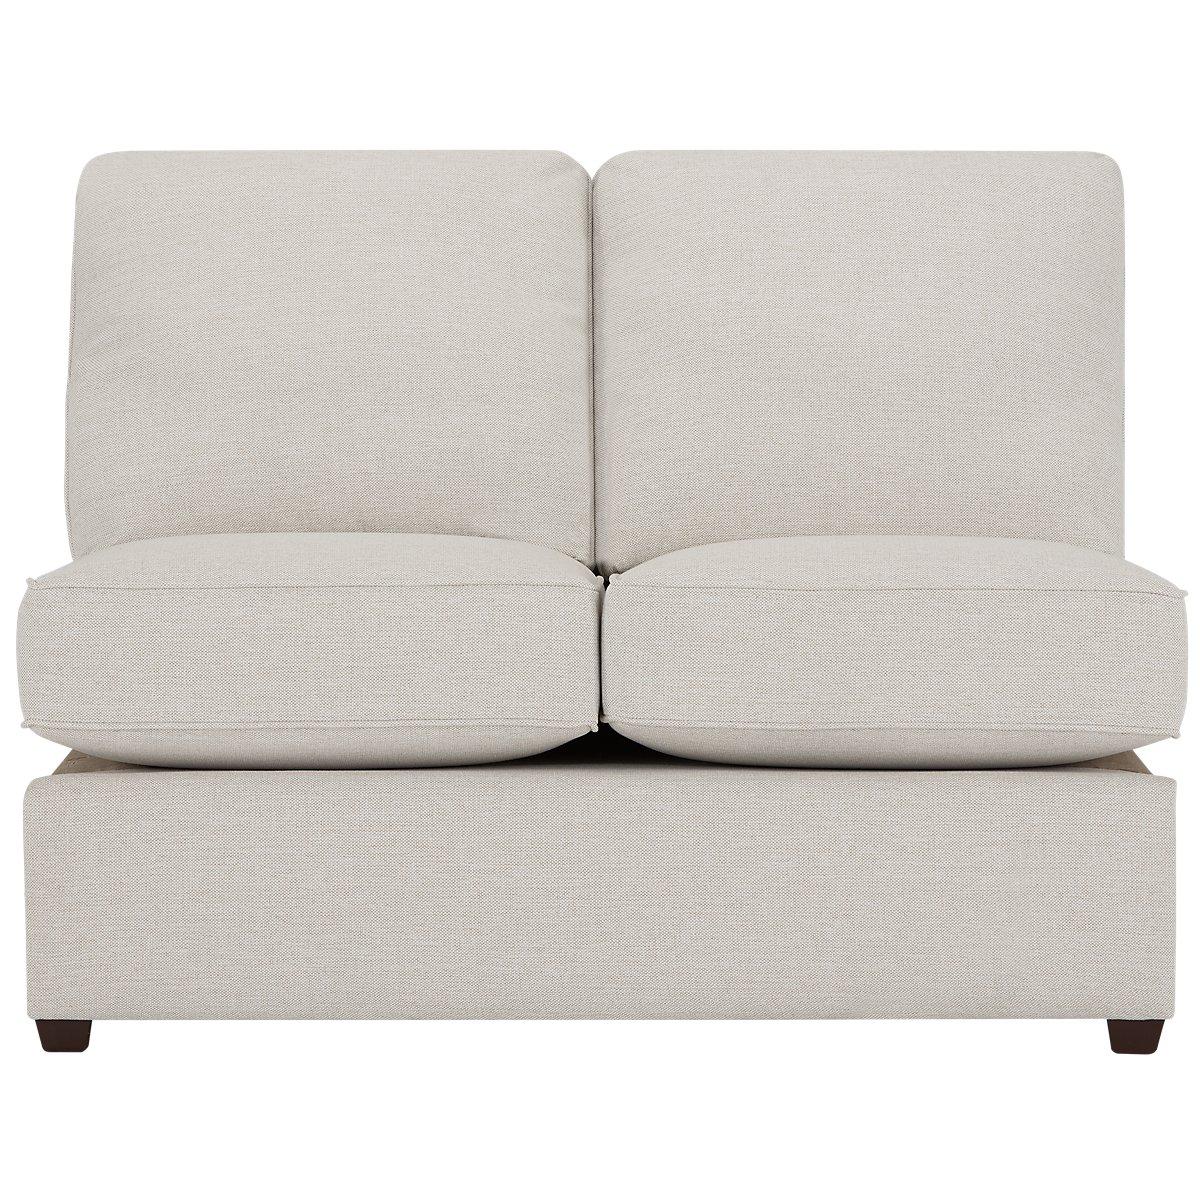 city furniture asheville light taupe fabric medium right. Black Bedroom Furniture Sets. Home Design Ideas